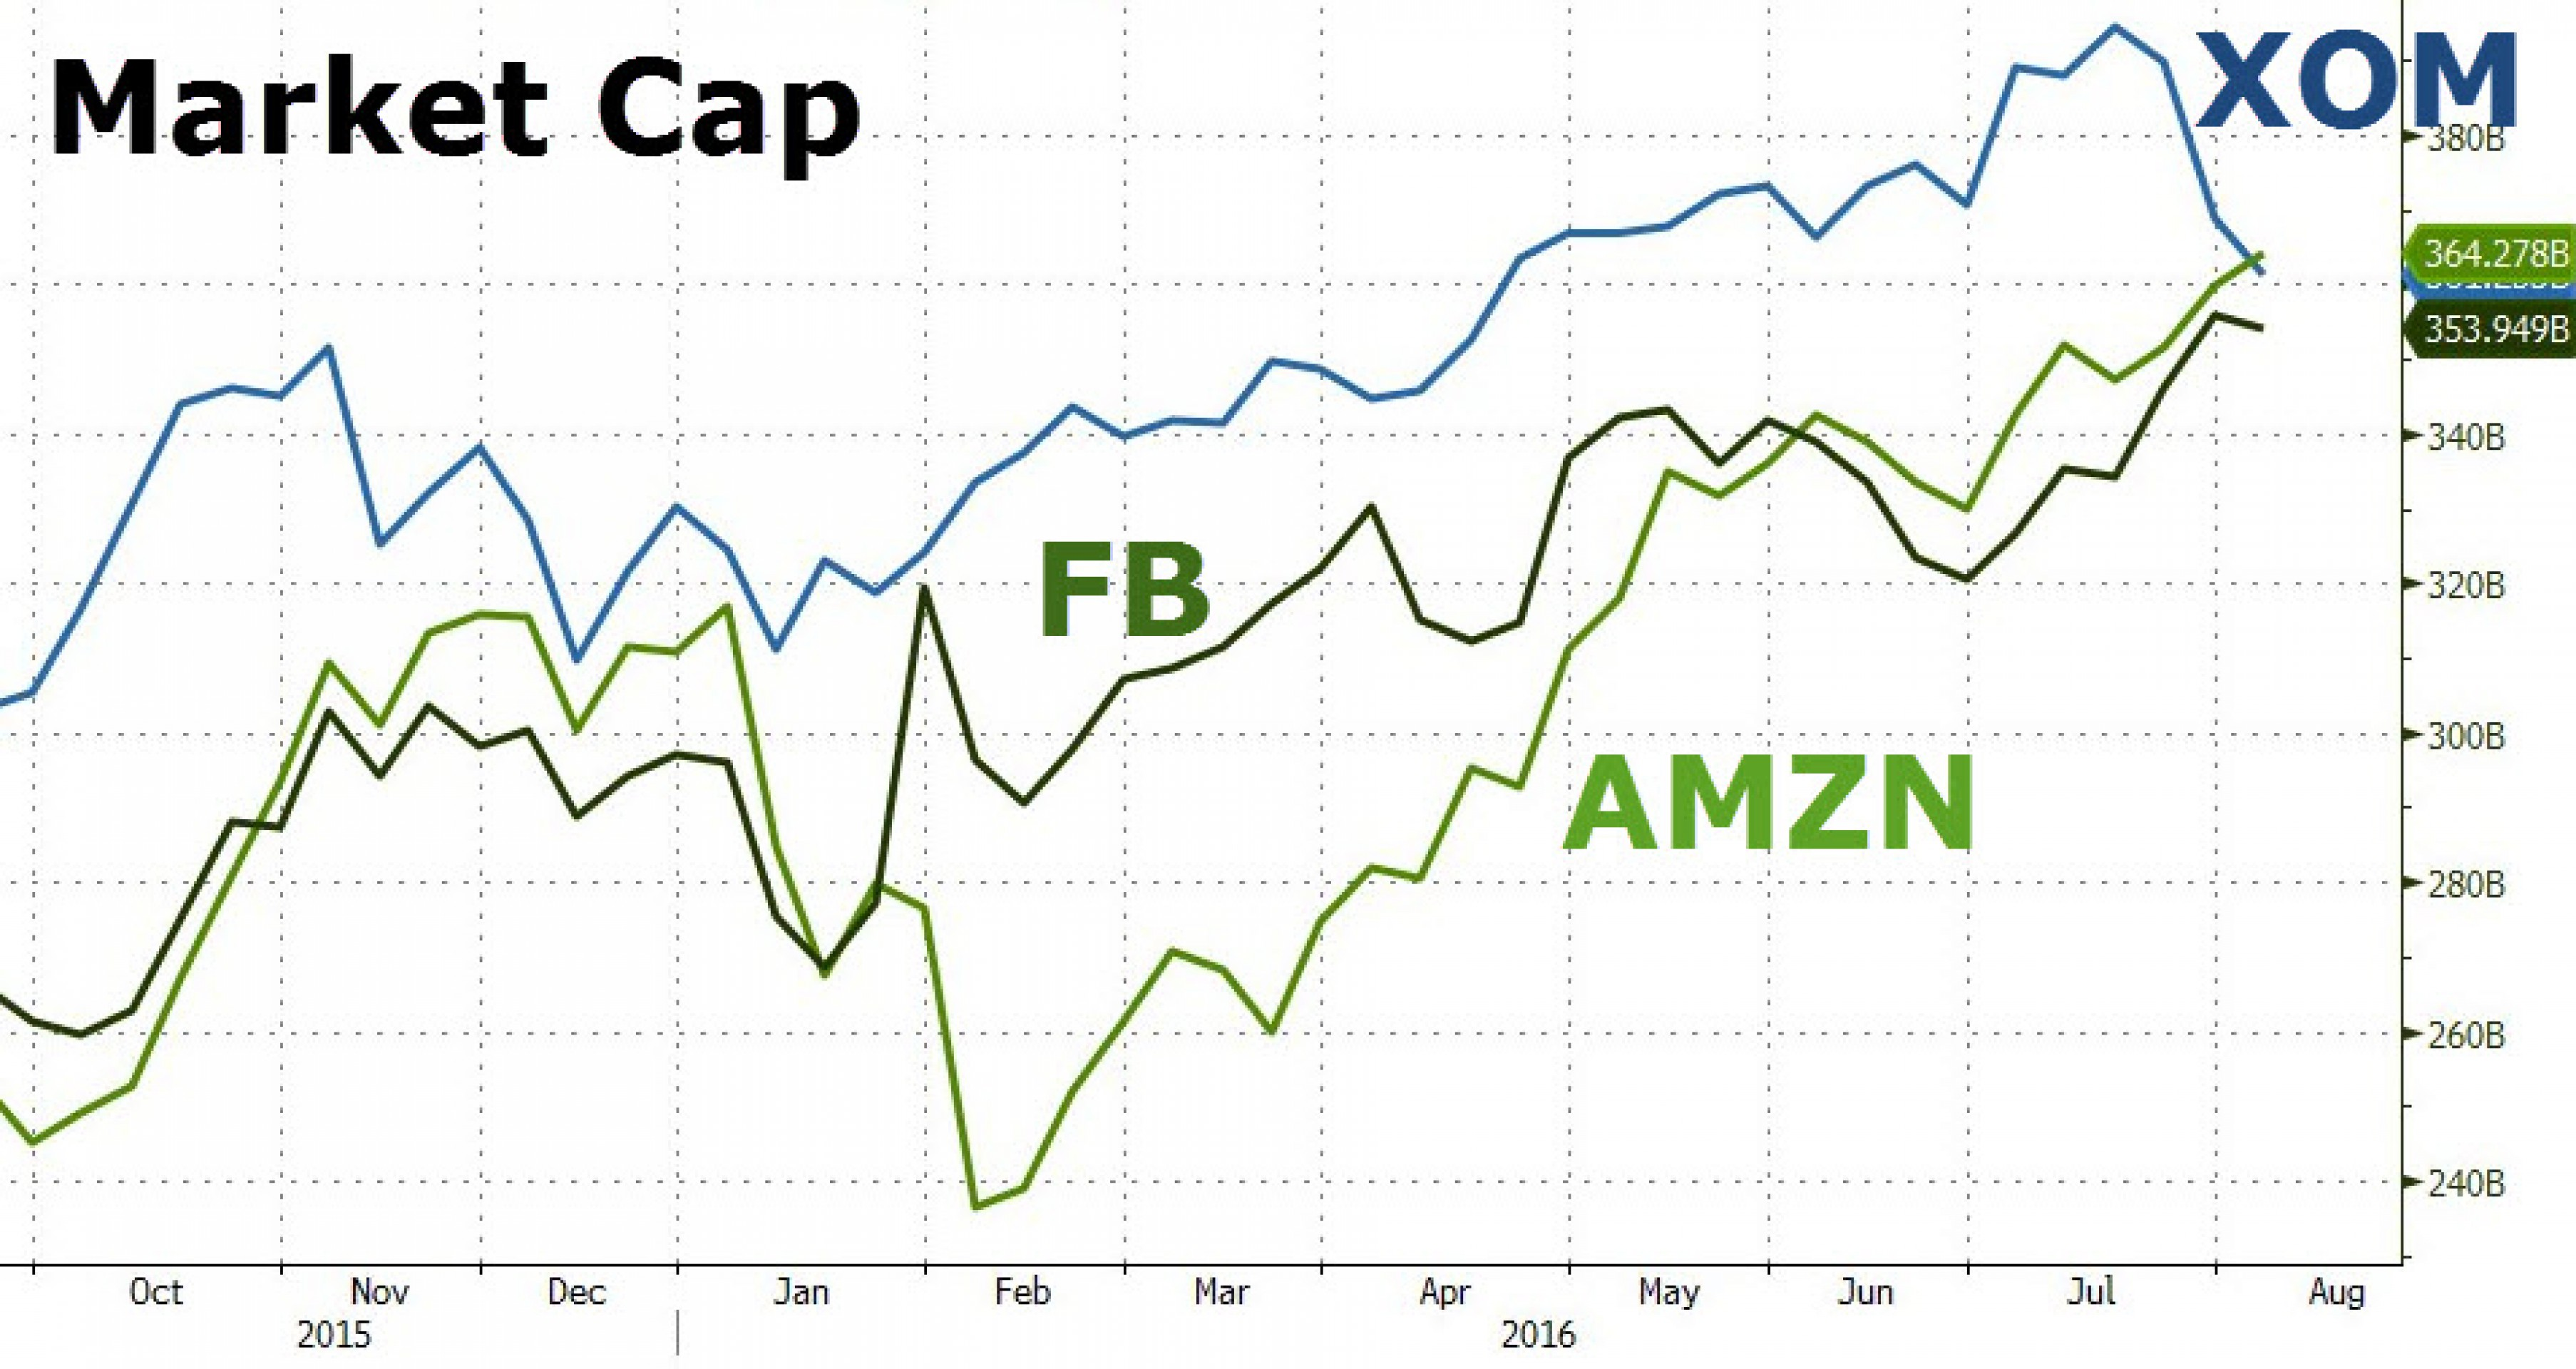 Amazon теперь дороже Exxon. Кто следующий?